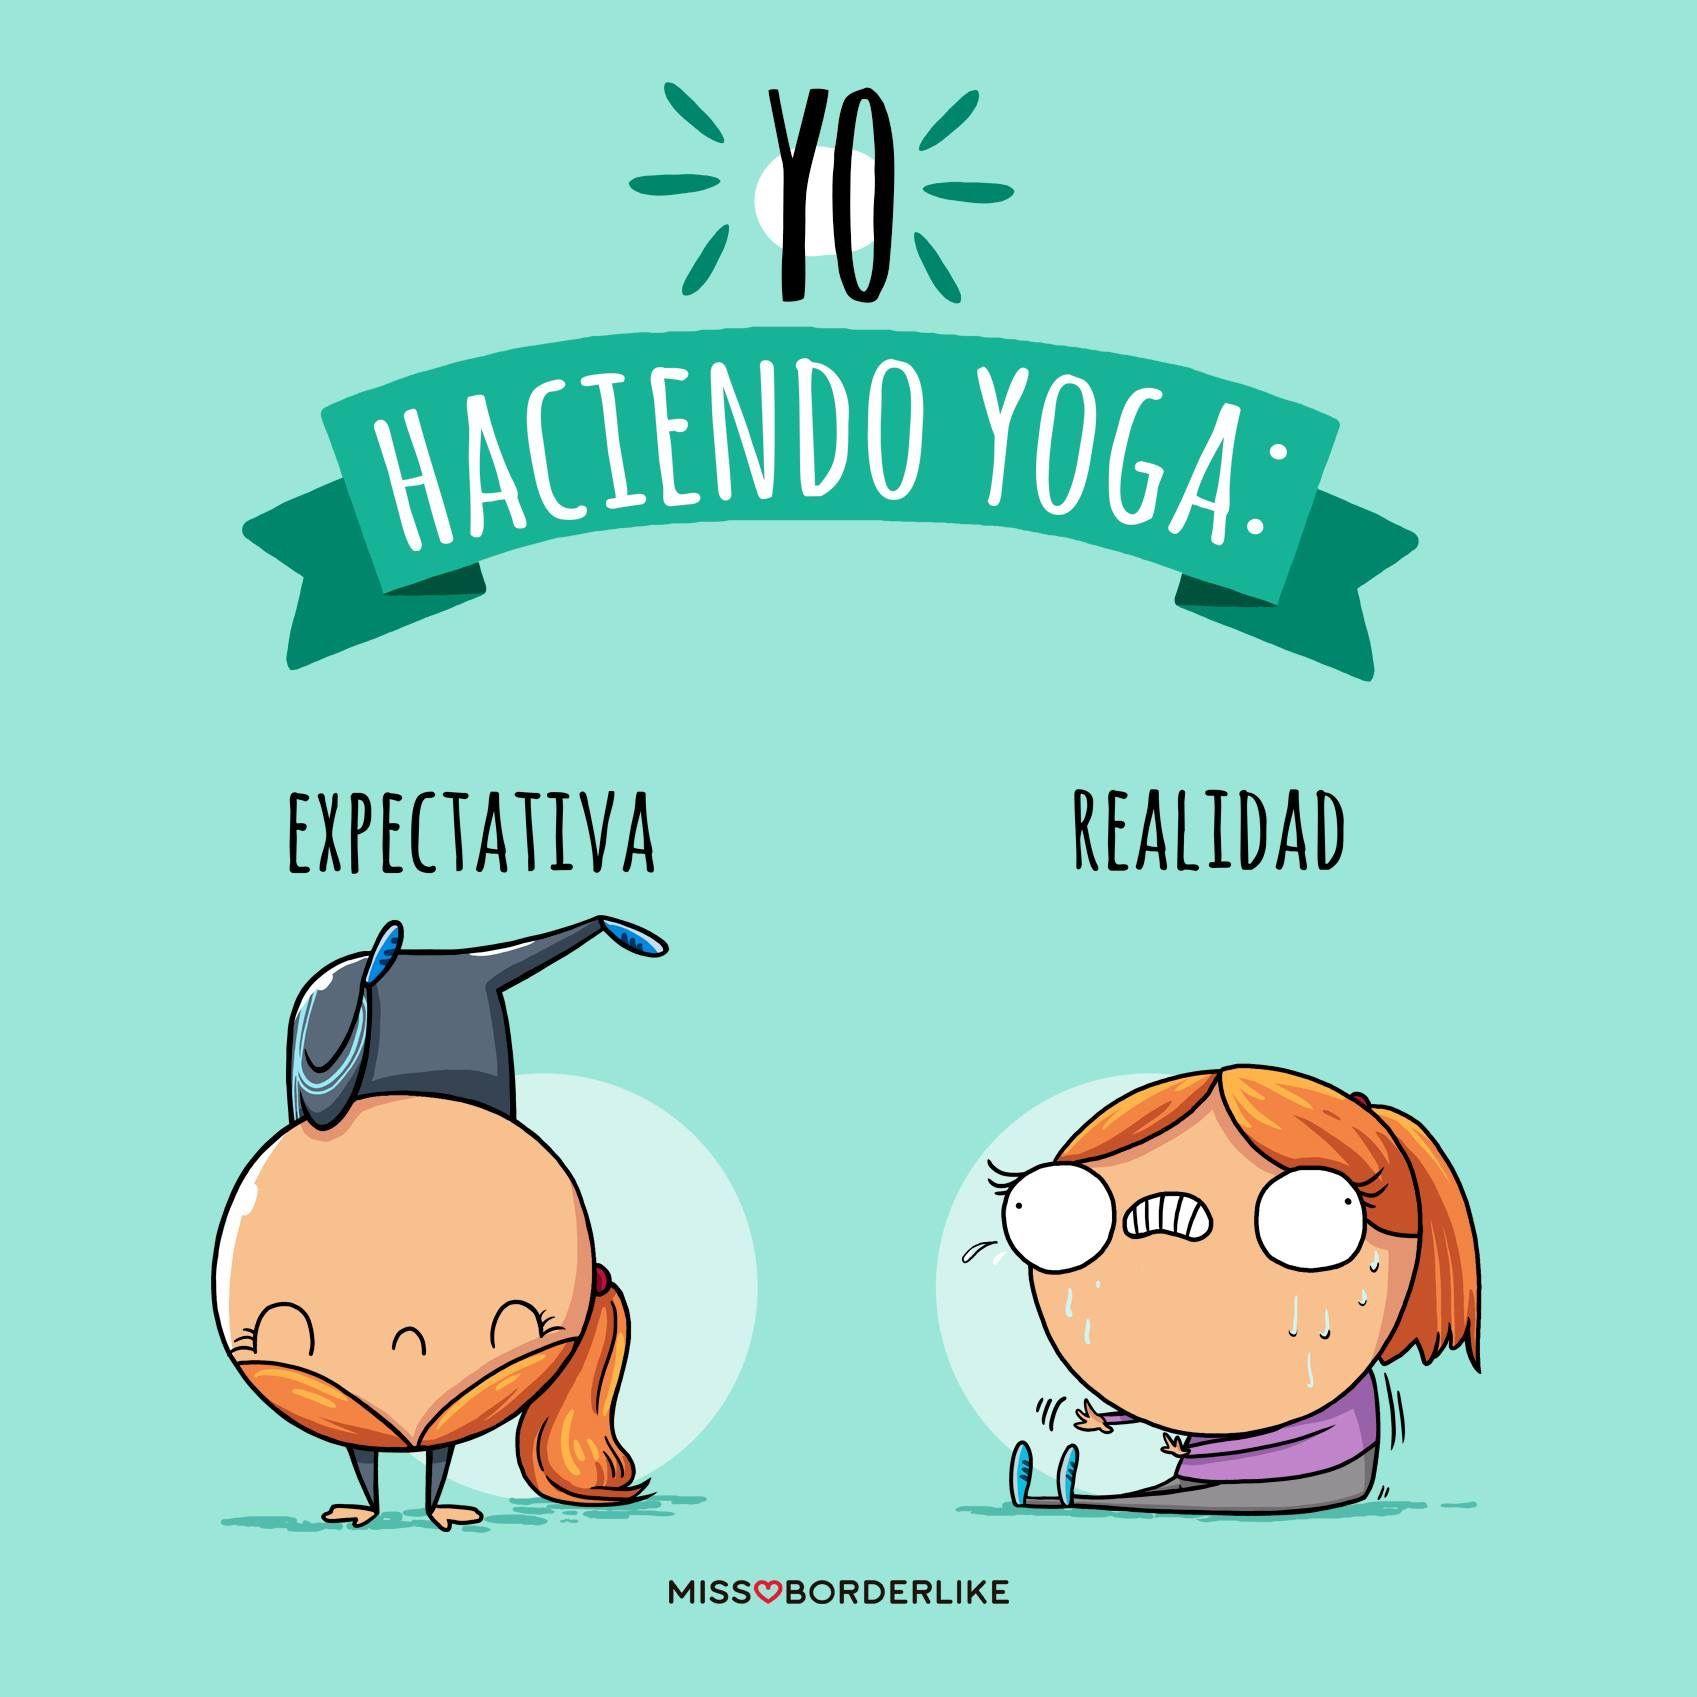 Yo haciendo yoga expectativa VS realidad Frases YogaAmor